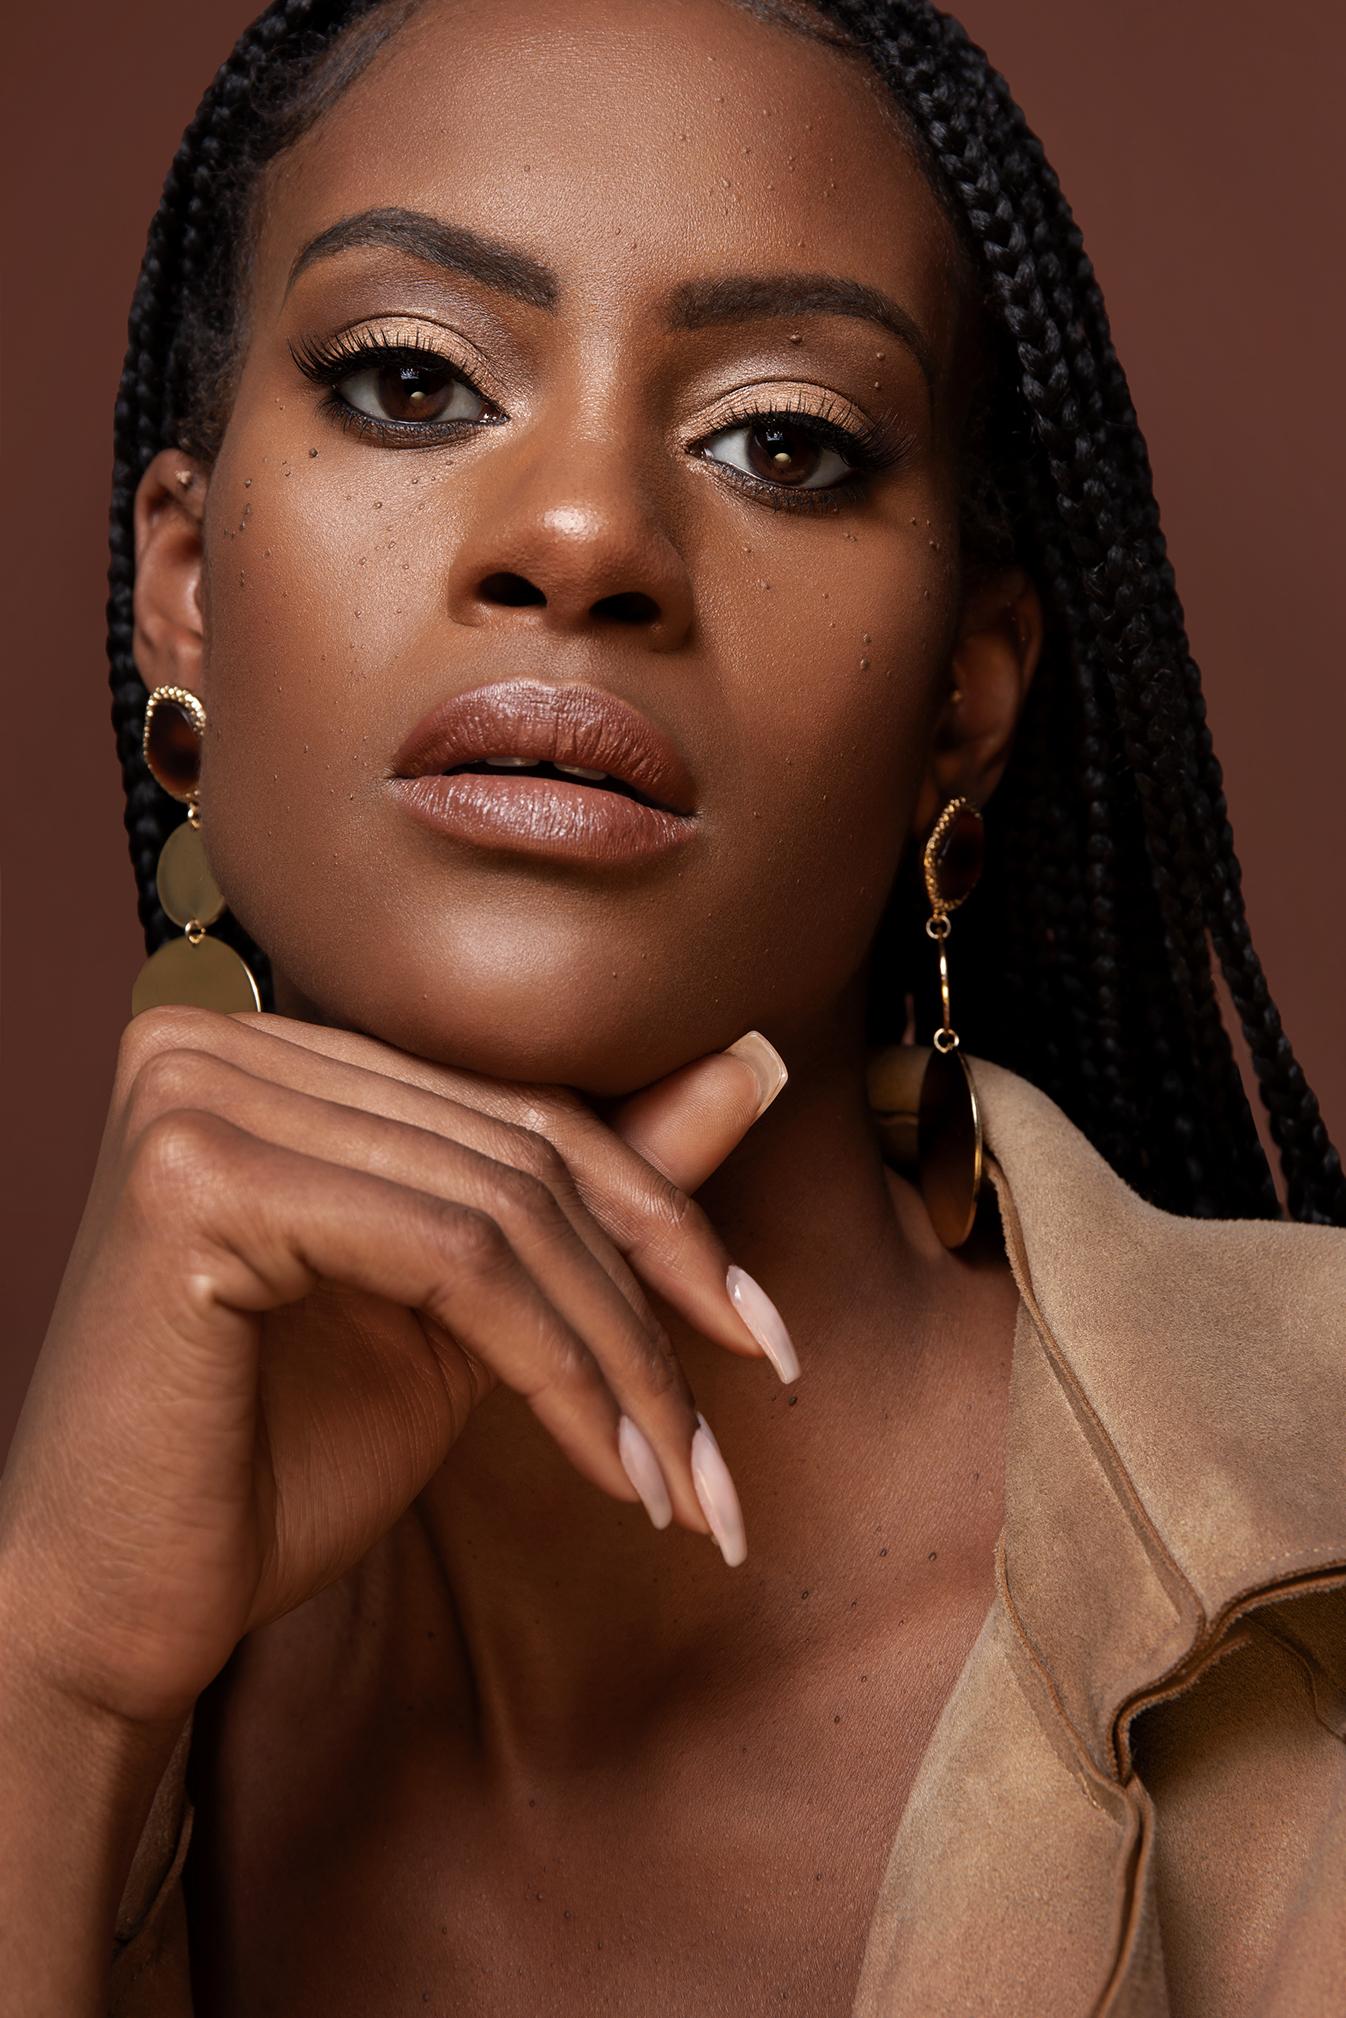 close-up-natural-makeup-black-skin